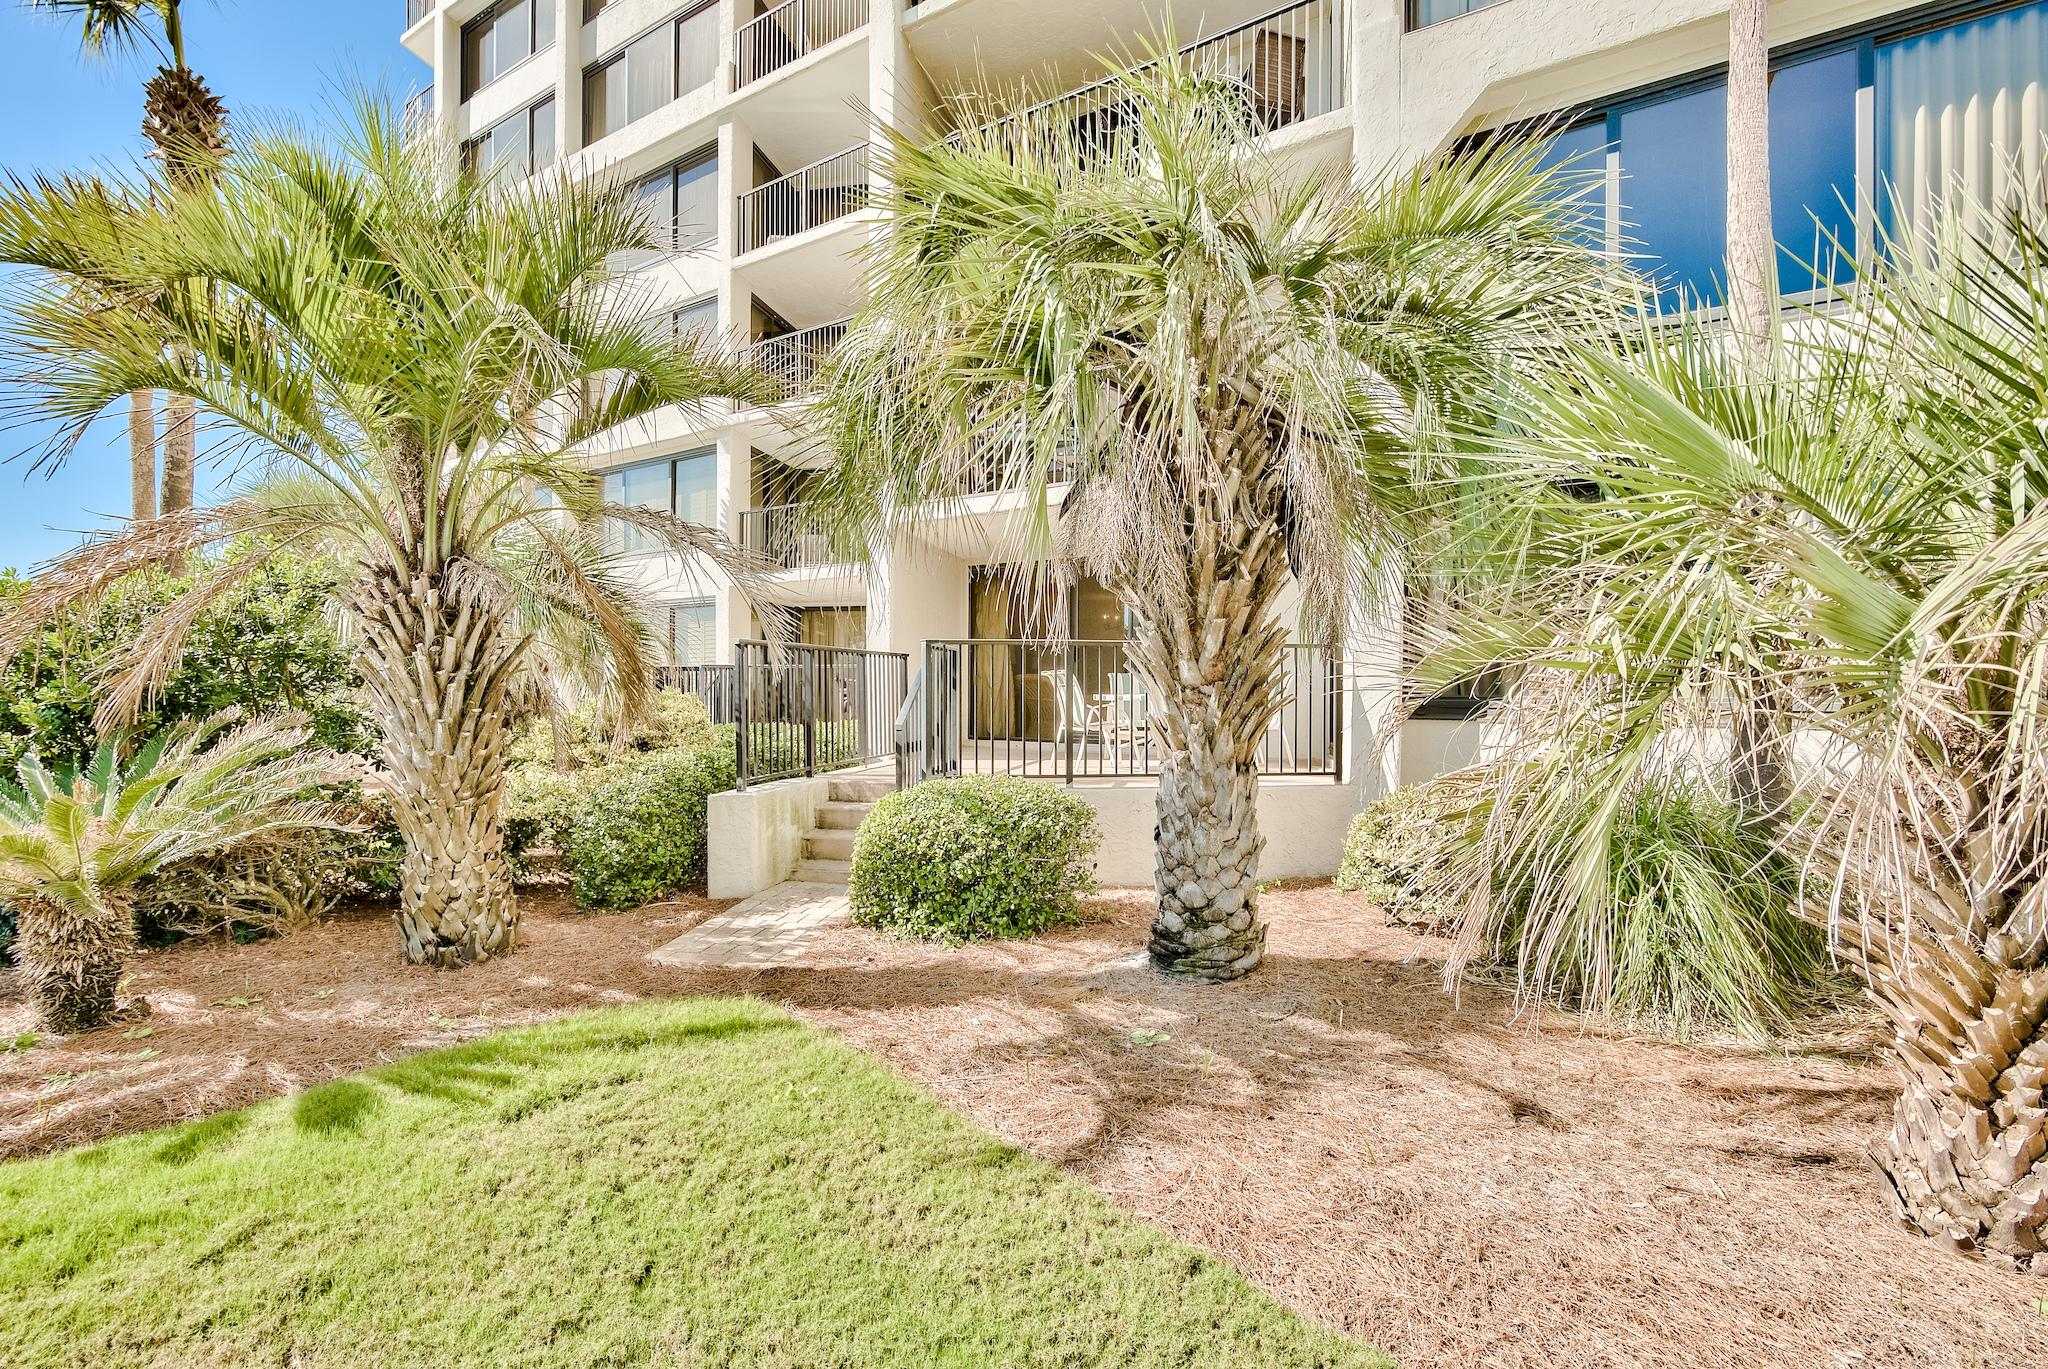 Photo of home for sale at 4017 Beachside One, Miramar Beach FL